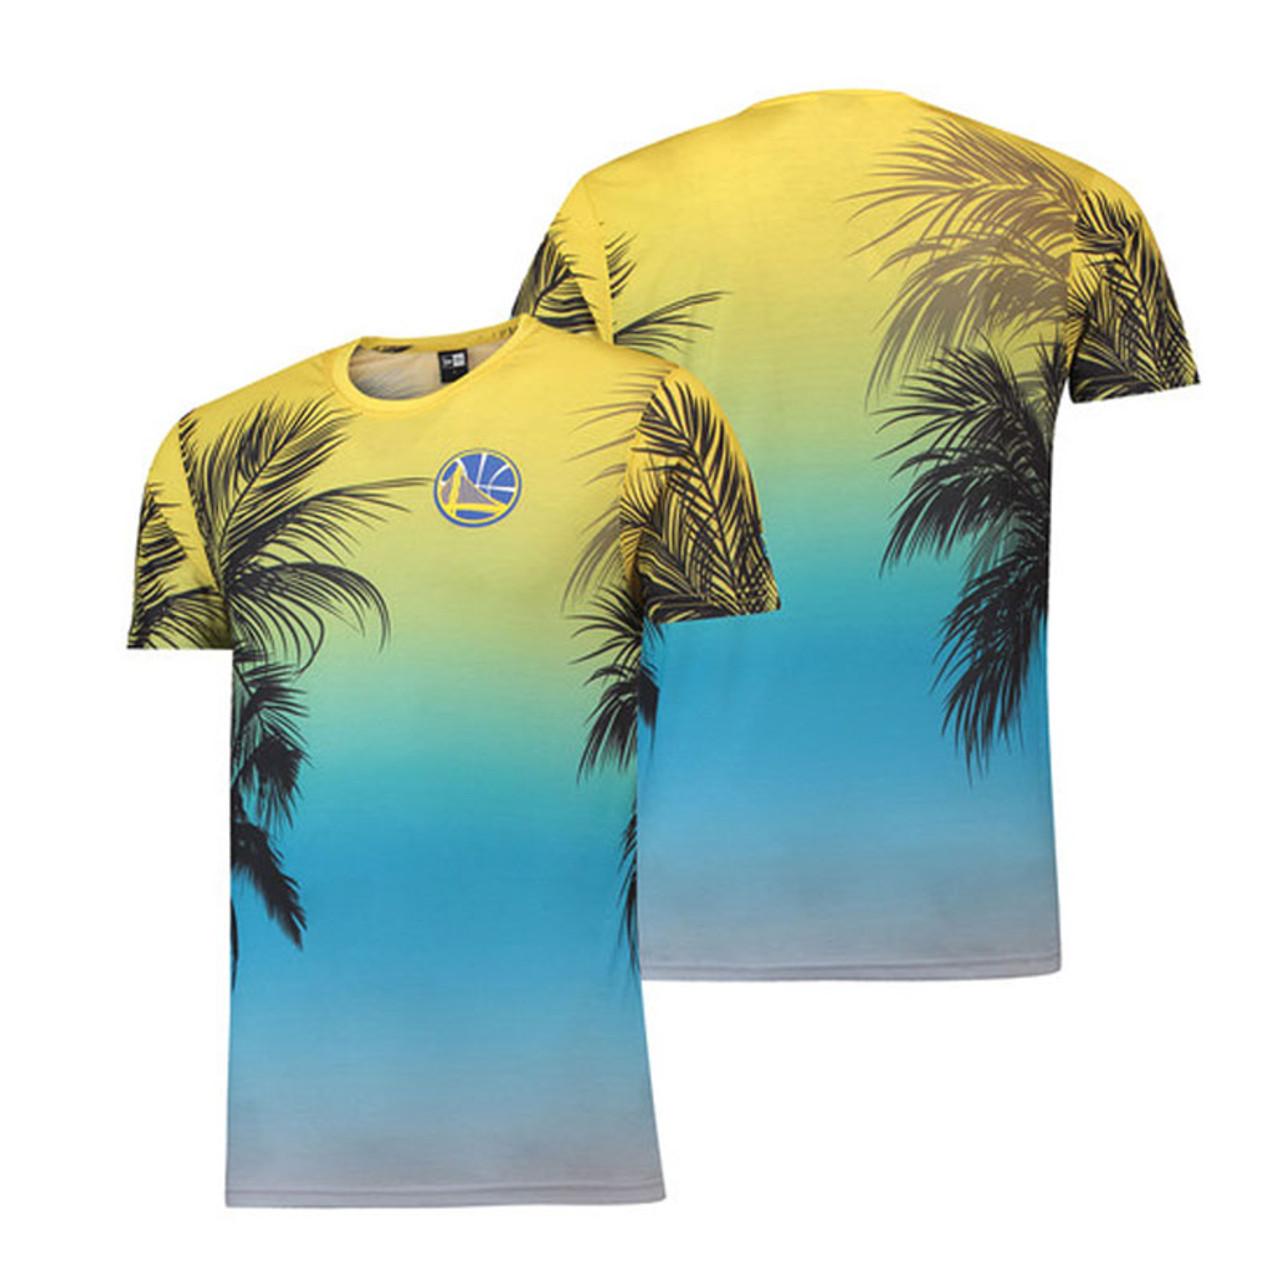 NEW ERA golden state warriors NBA coastal heat t-shirt  yellow  4ee047237